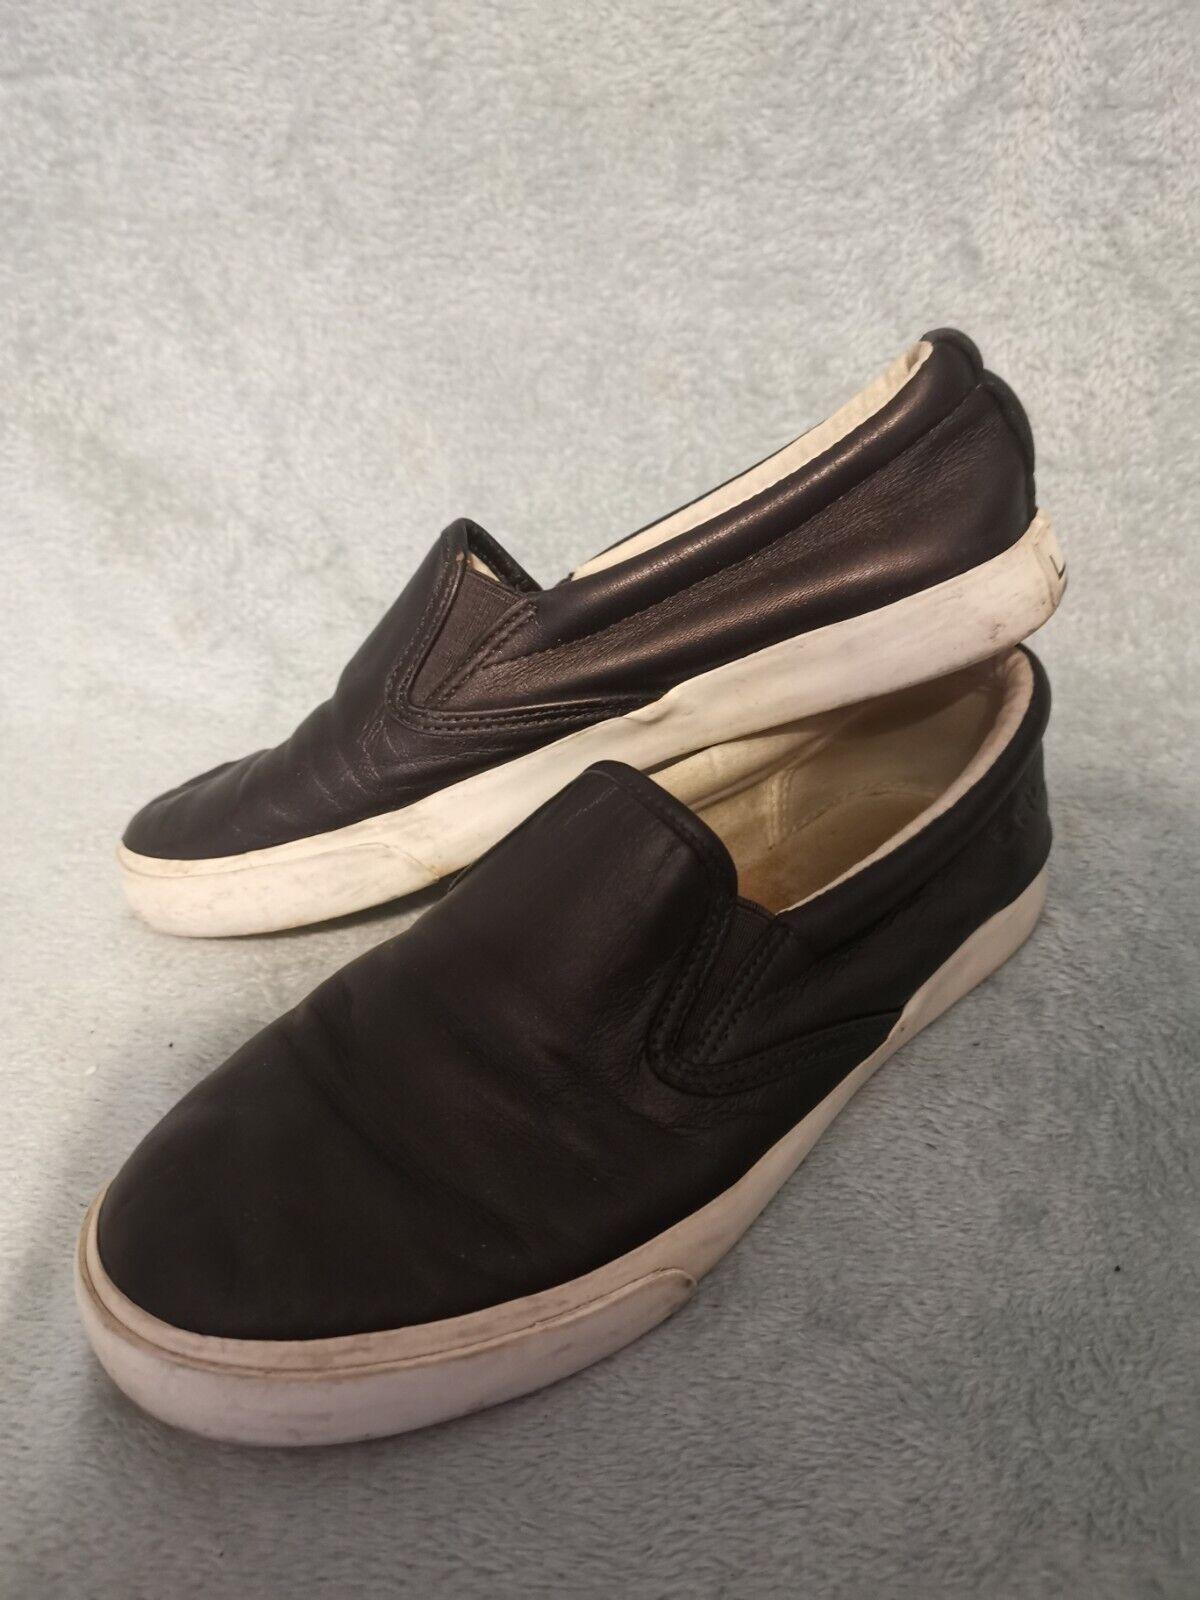 Leather Ralph Lauren UK 6 Slip On Trainers 👽